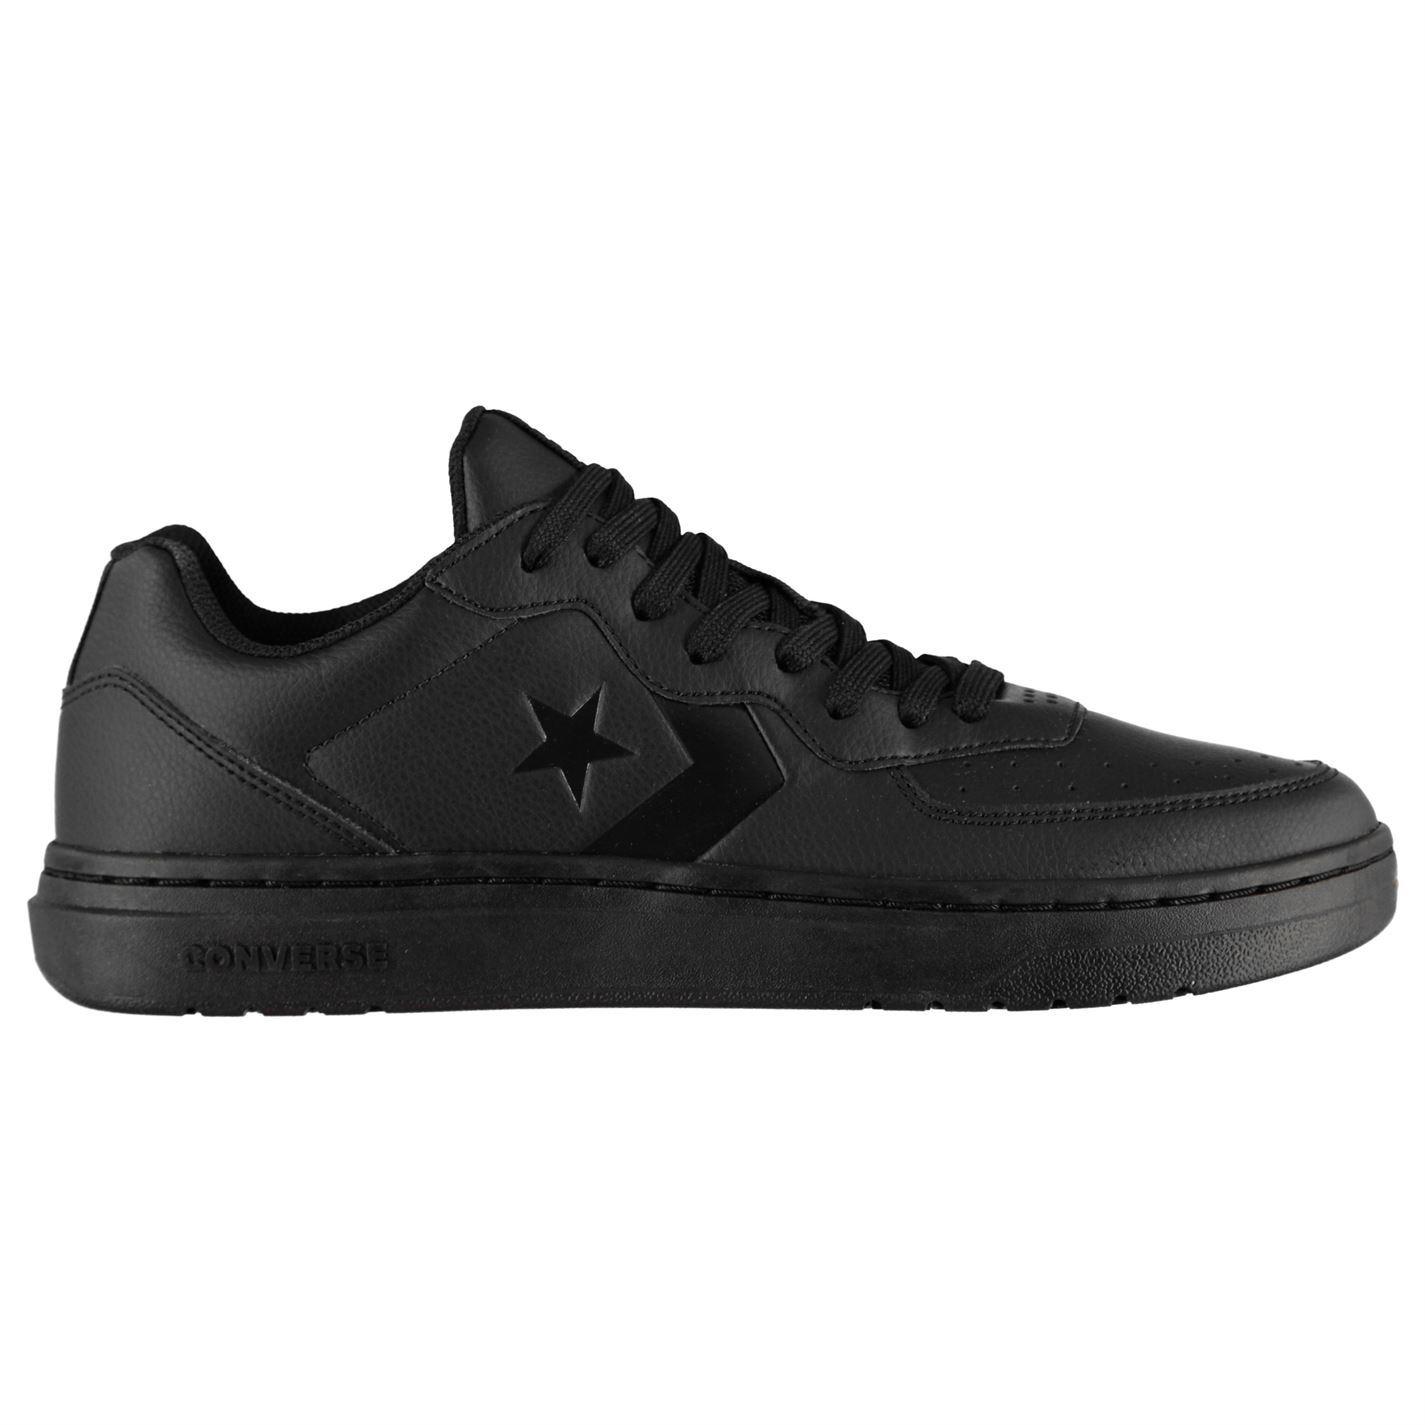 Converse-Ox-Rival-Cuir-Baskets-Pour-Homme-Chaussures-De-Loisirs-Chaussures-Baskets miniature 7